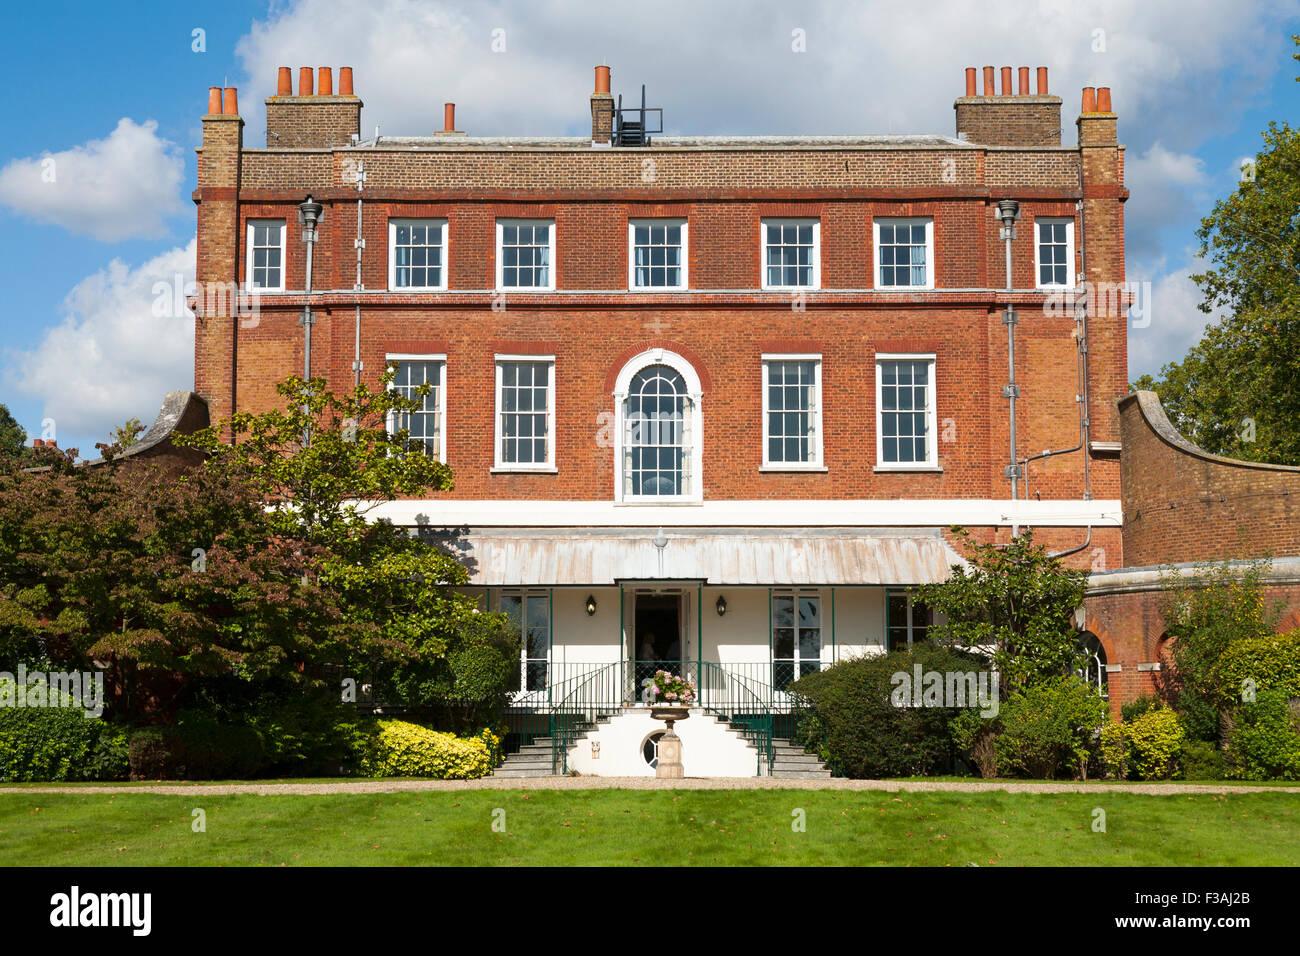 Bushy House South Facade Aspect Part Of The National Physical Laboratory NPL In Park Teddington UK